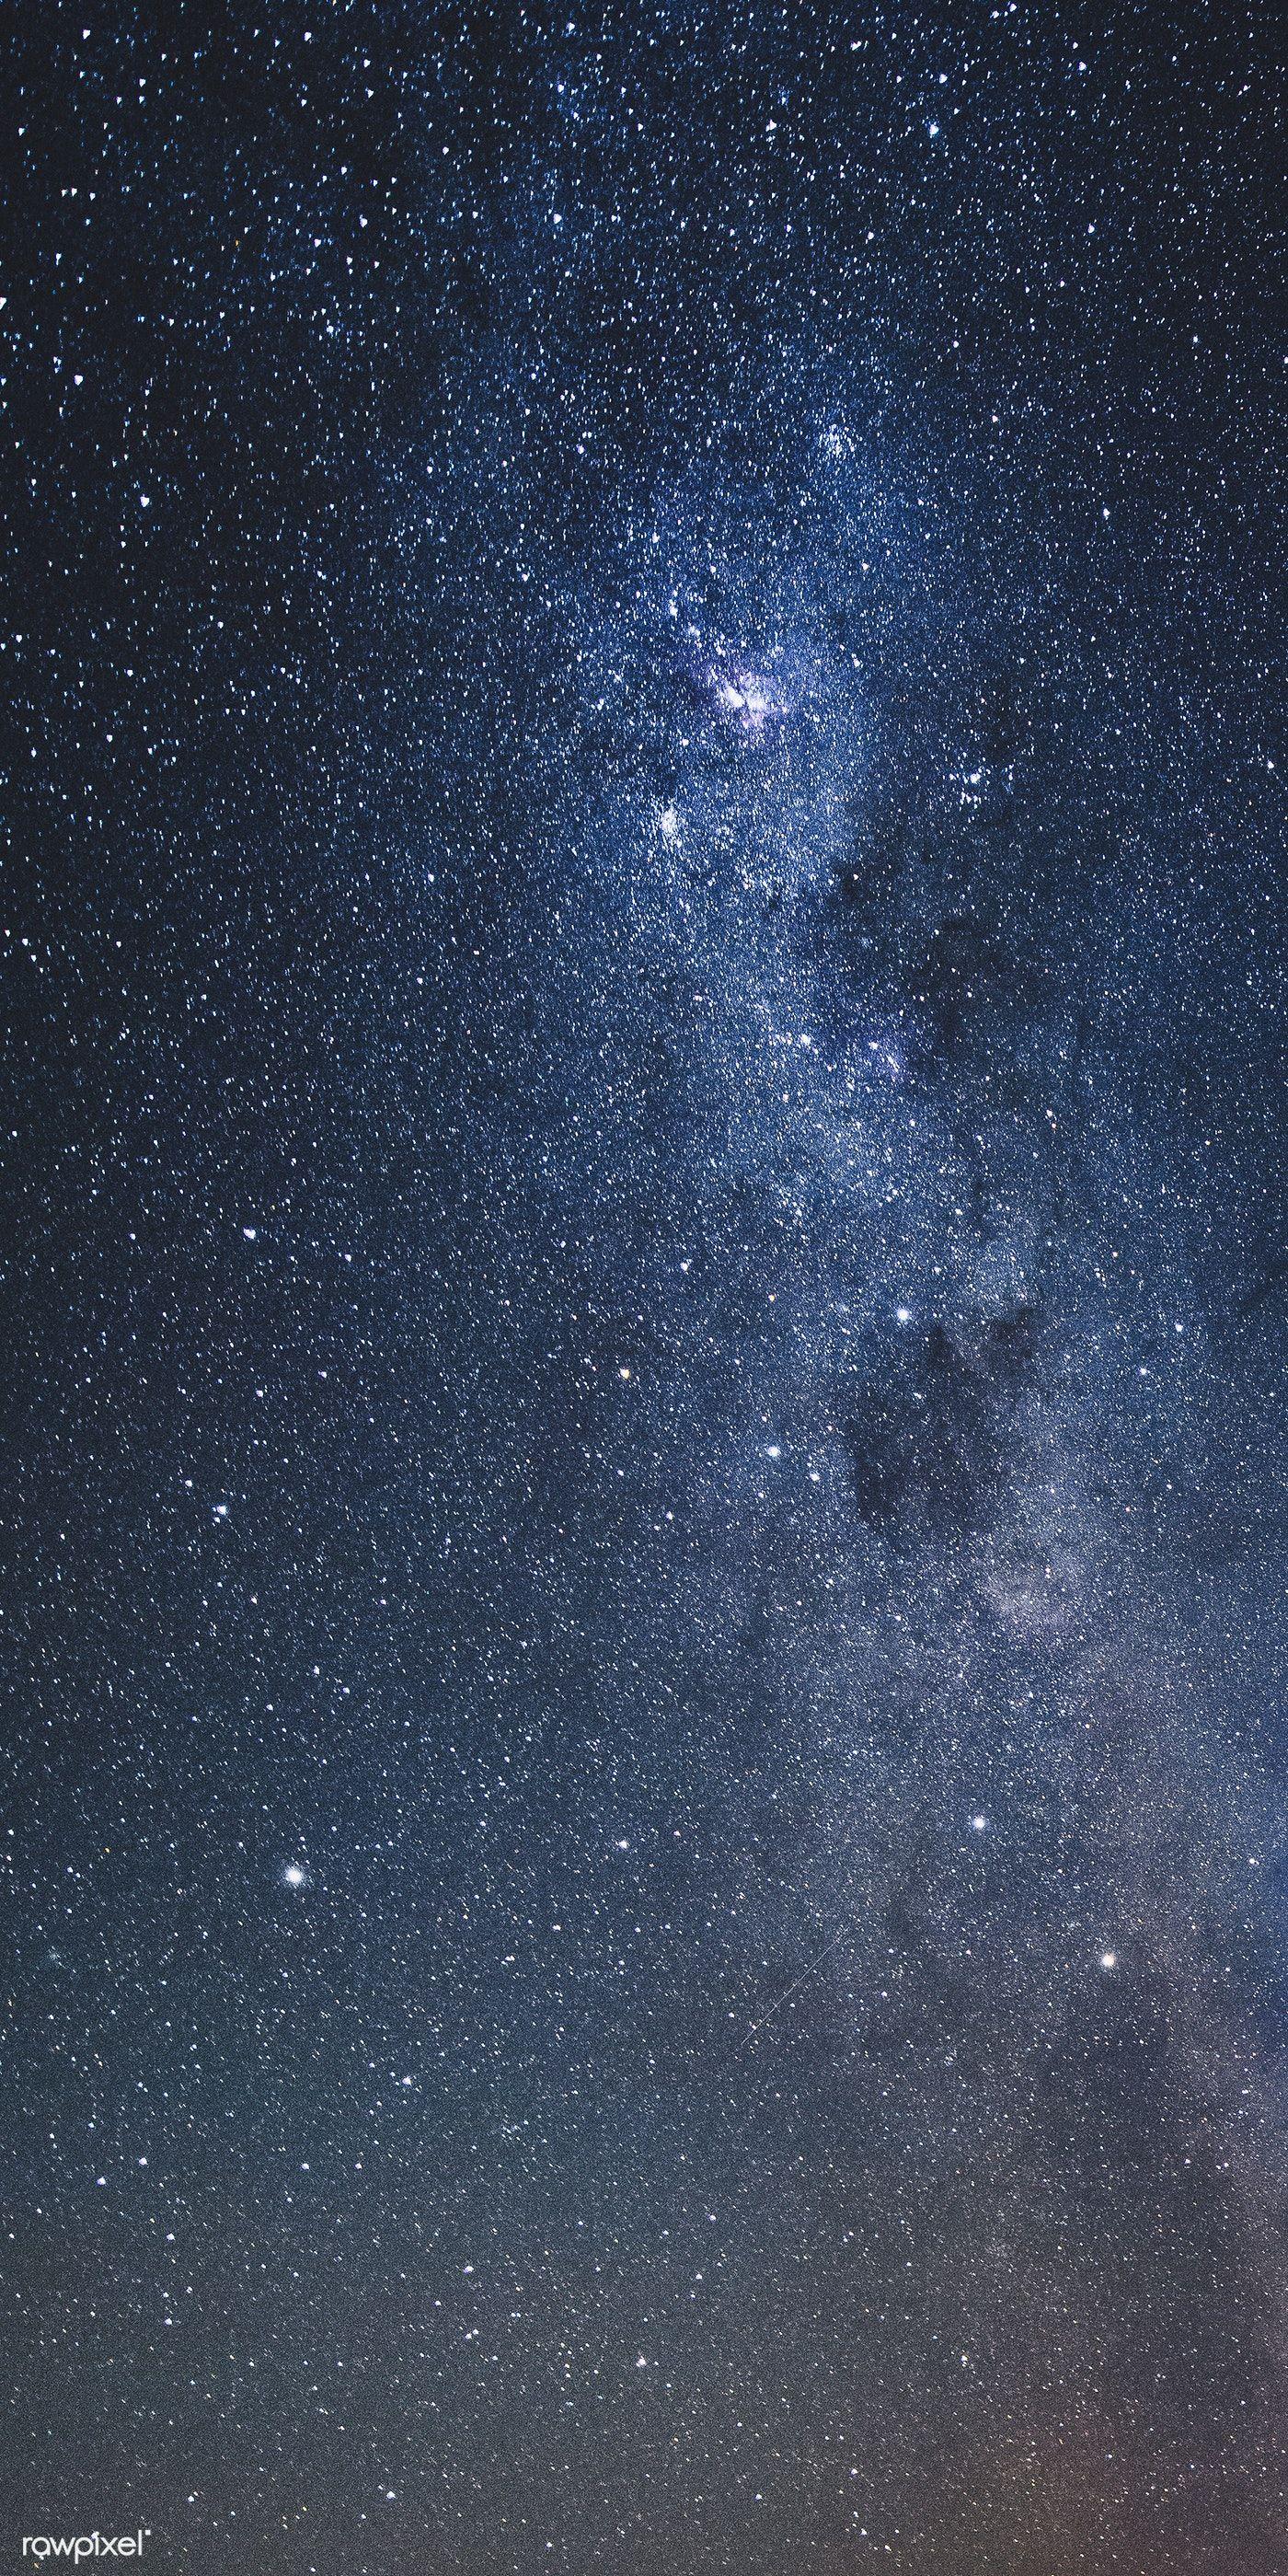 Download Premium Photo Of Beautiful Milky Way In The Night Sky